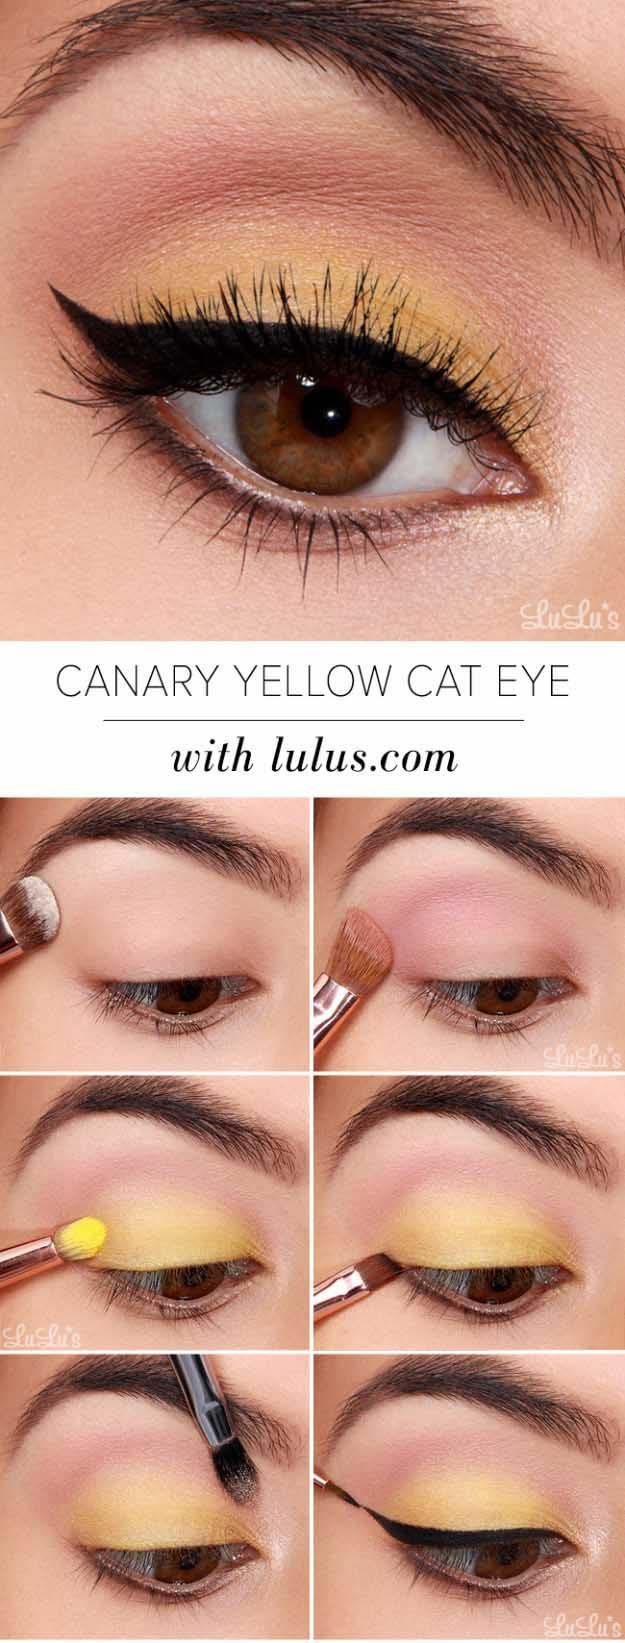 Eyeshadow Tutorials For Beginners Canary Yellow Eye Makeup